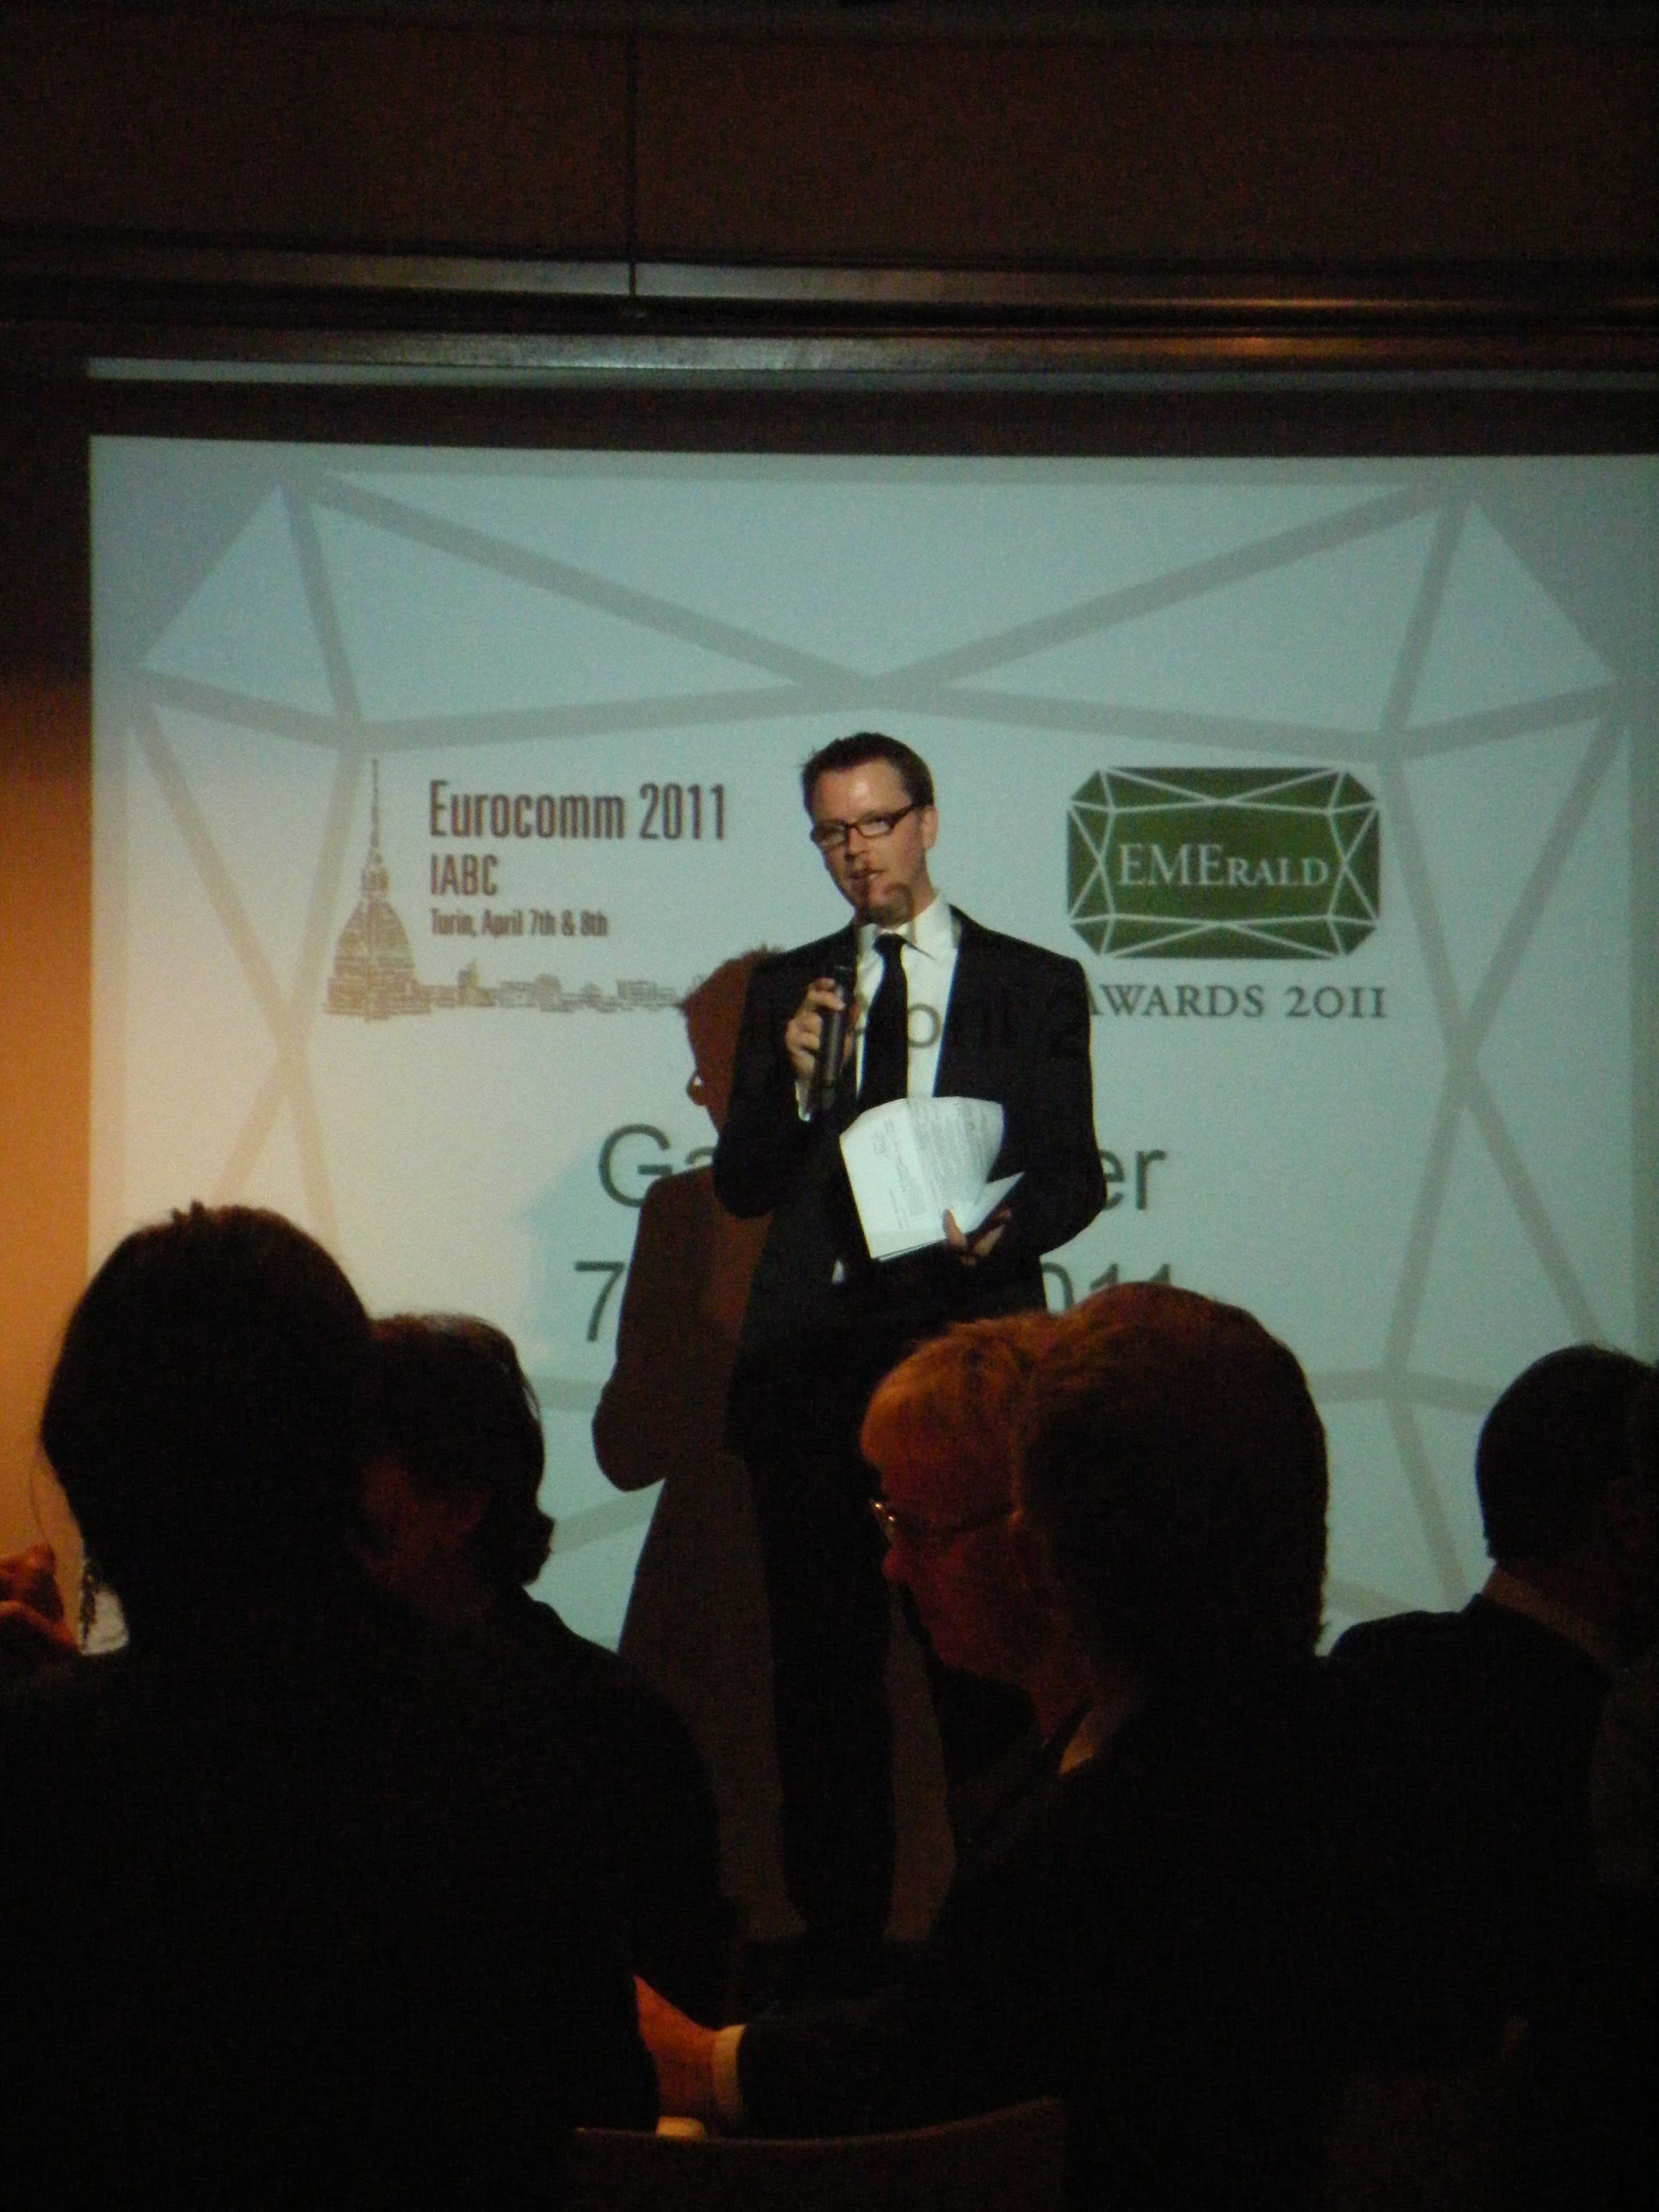 Michael Ambjorn at Eurocomm